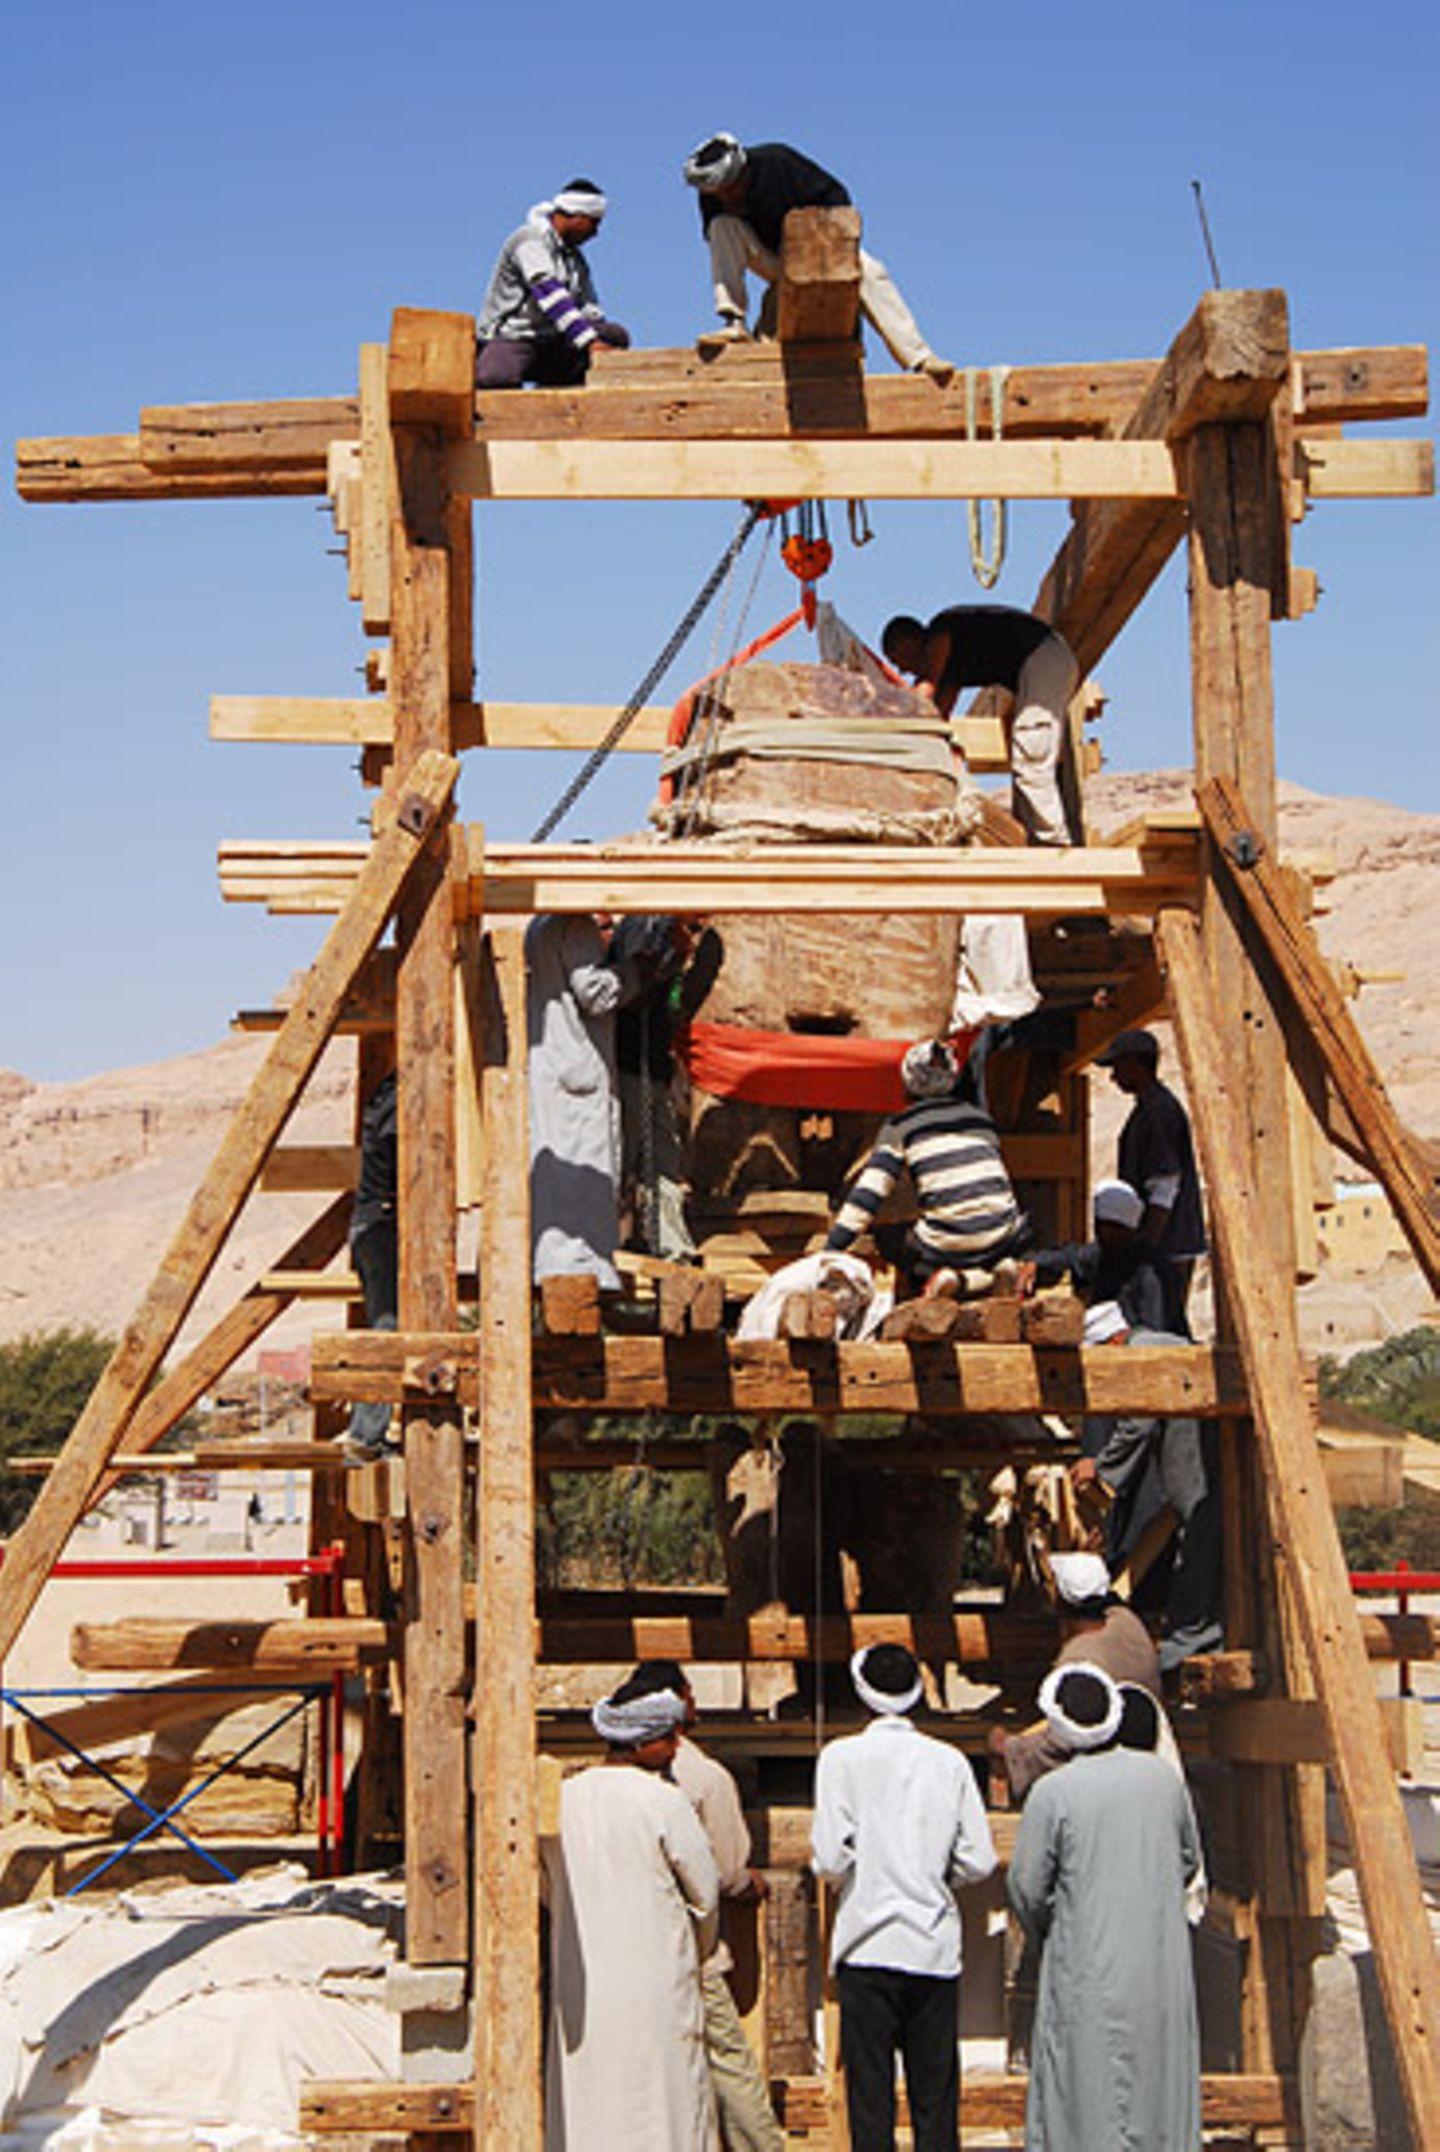 Altes Ägypten: Memnon in Not - Bild 6